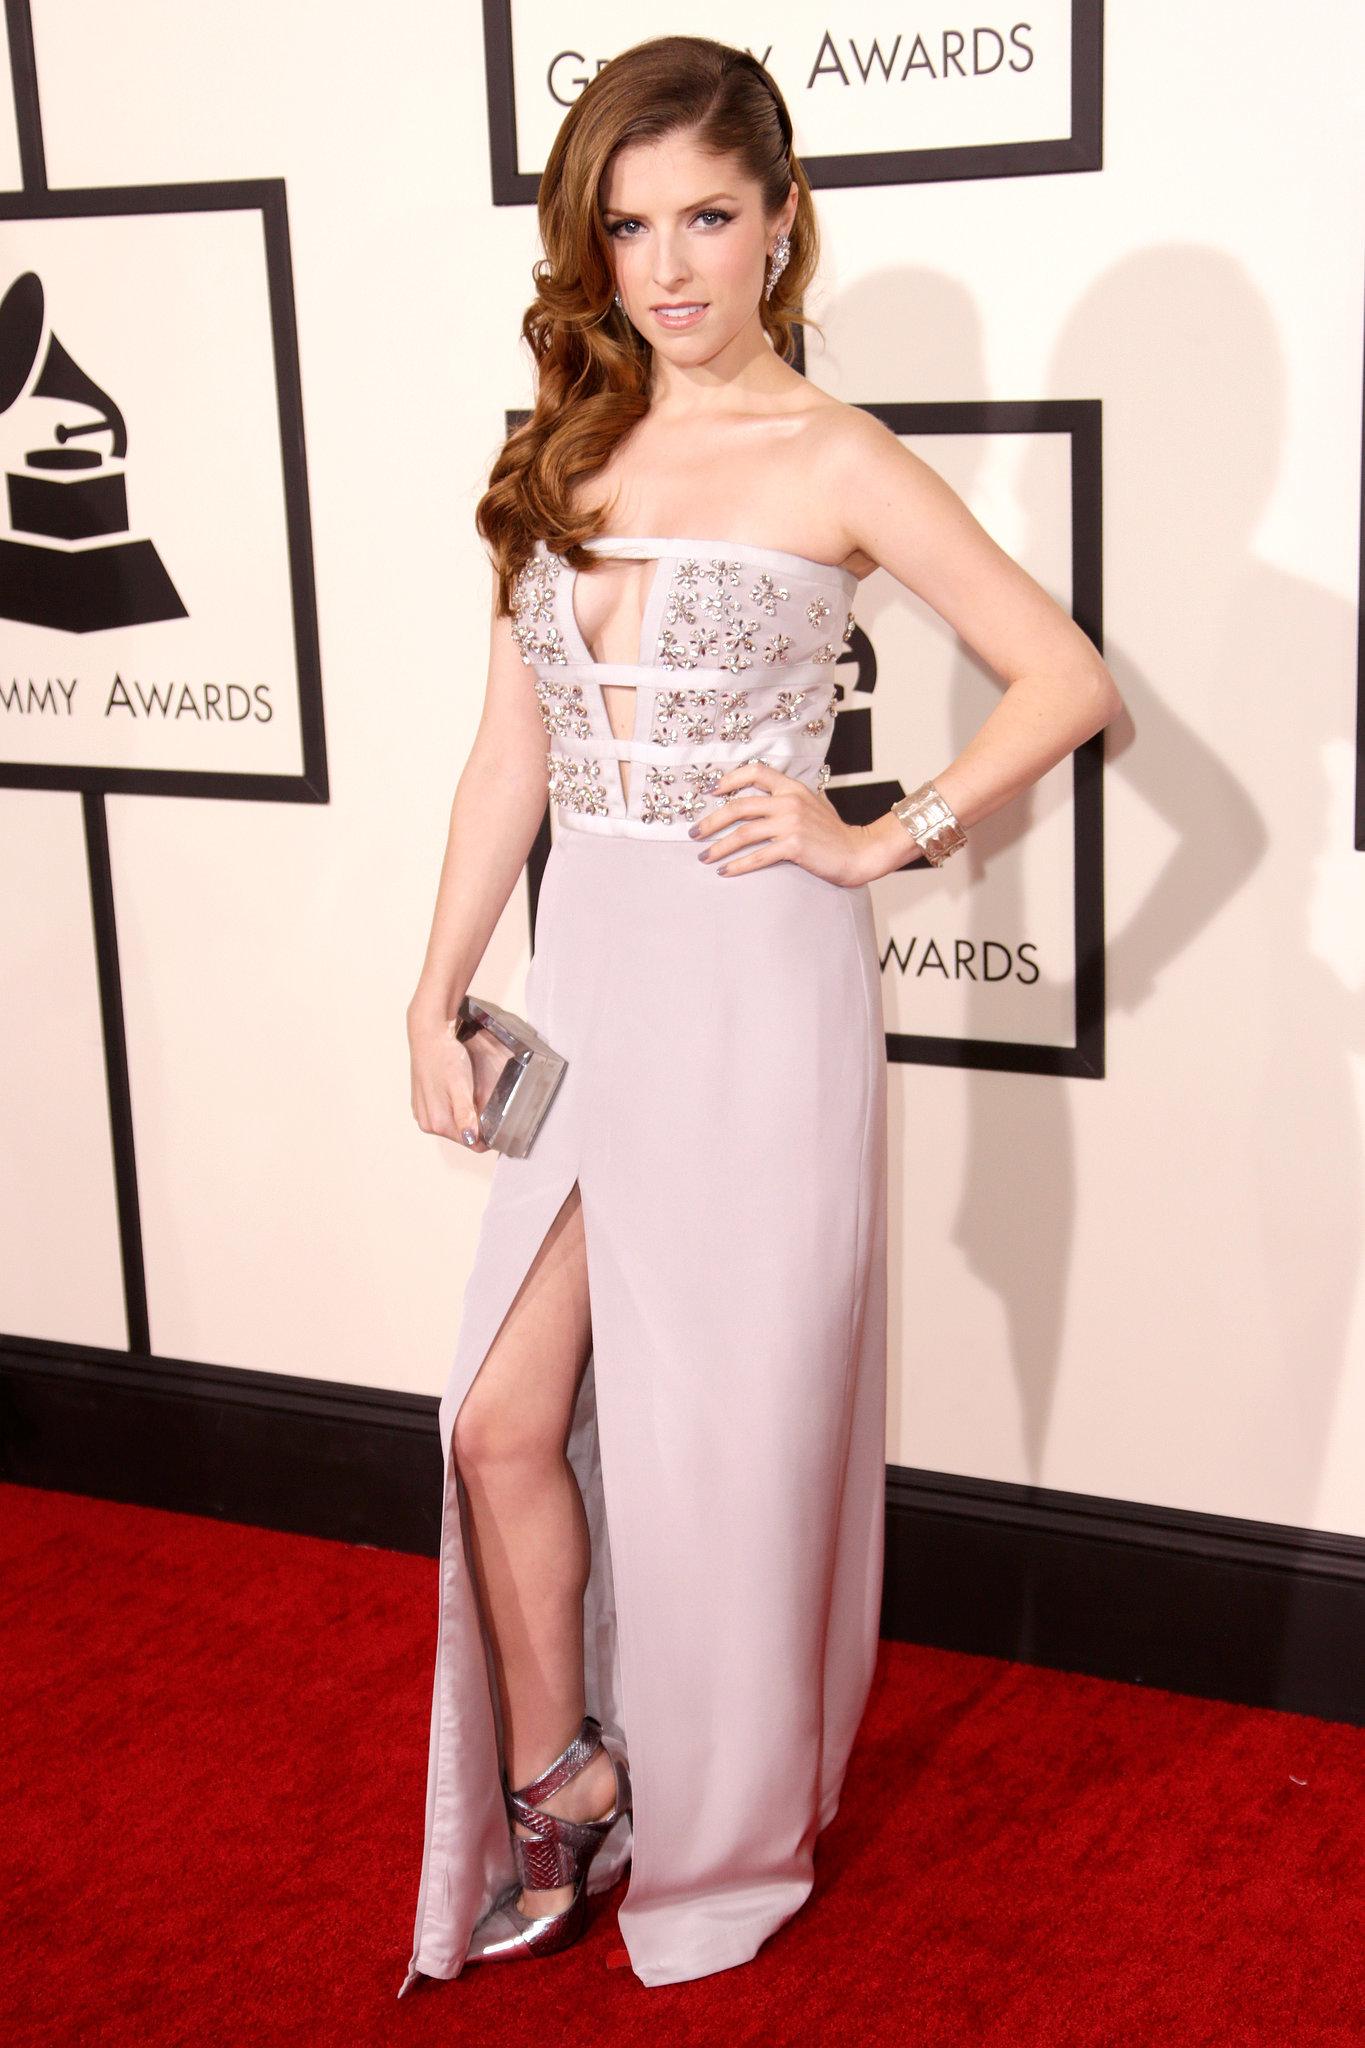 Anna Kendrick at the Grammys 2014